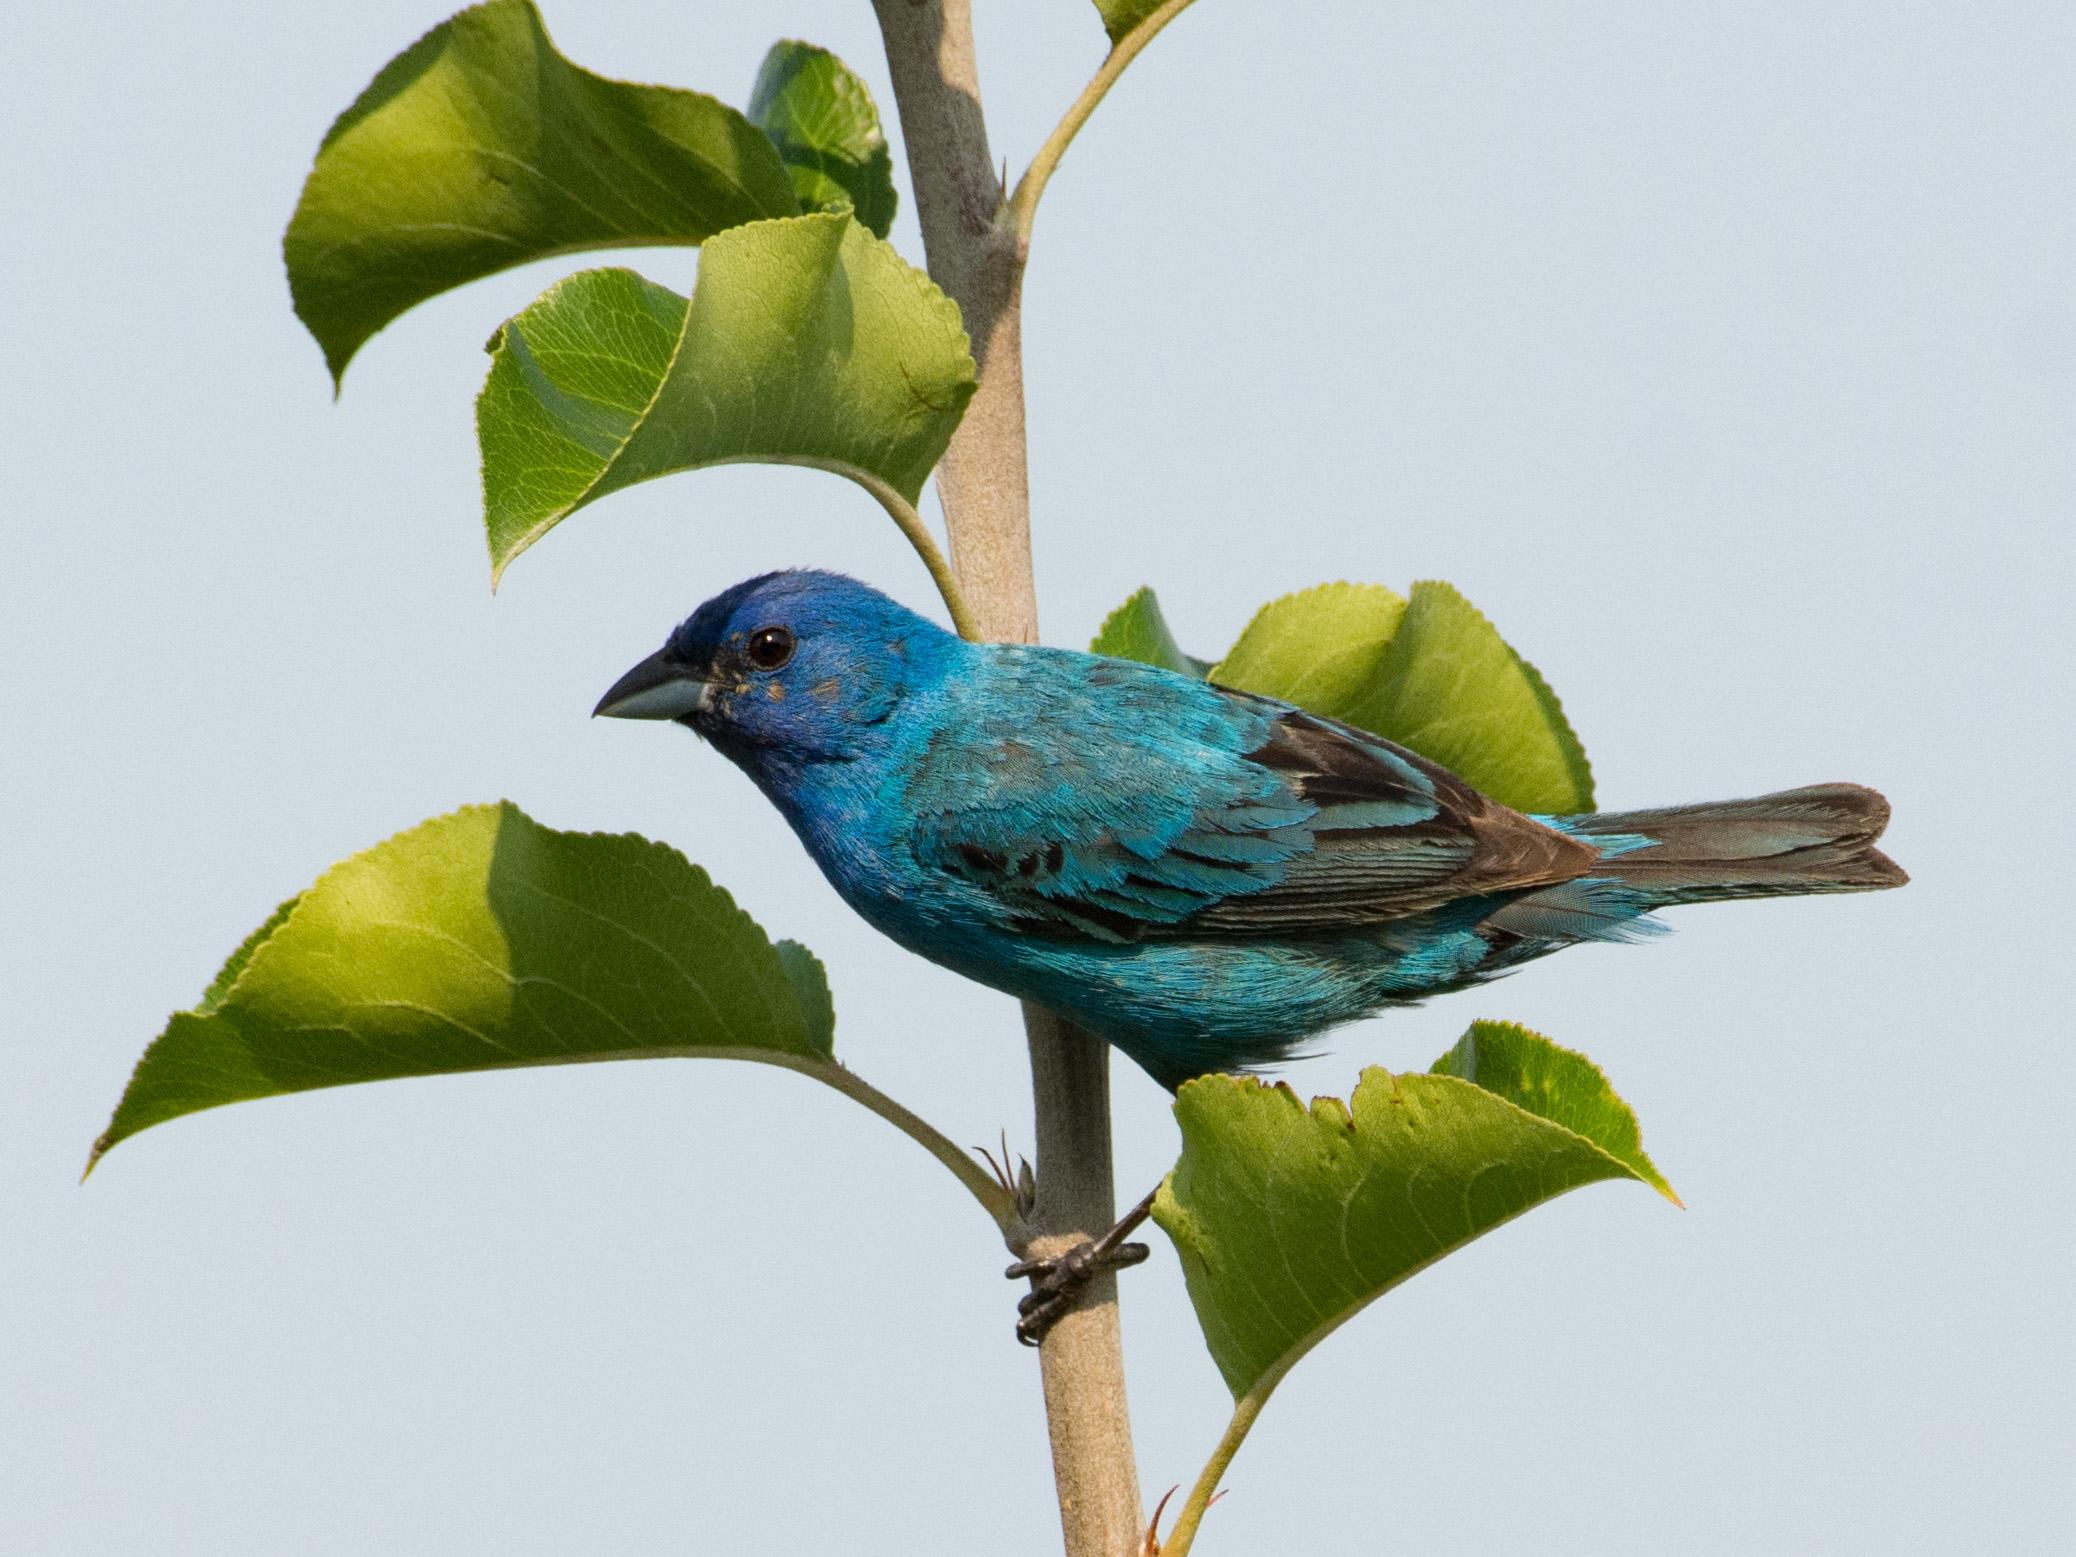 Indigo Bunting. Tamima Itani/Audubon Photography Awards